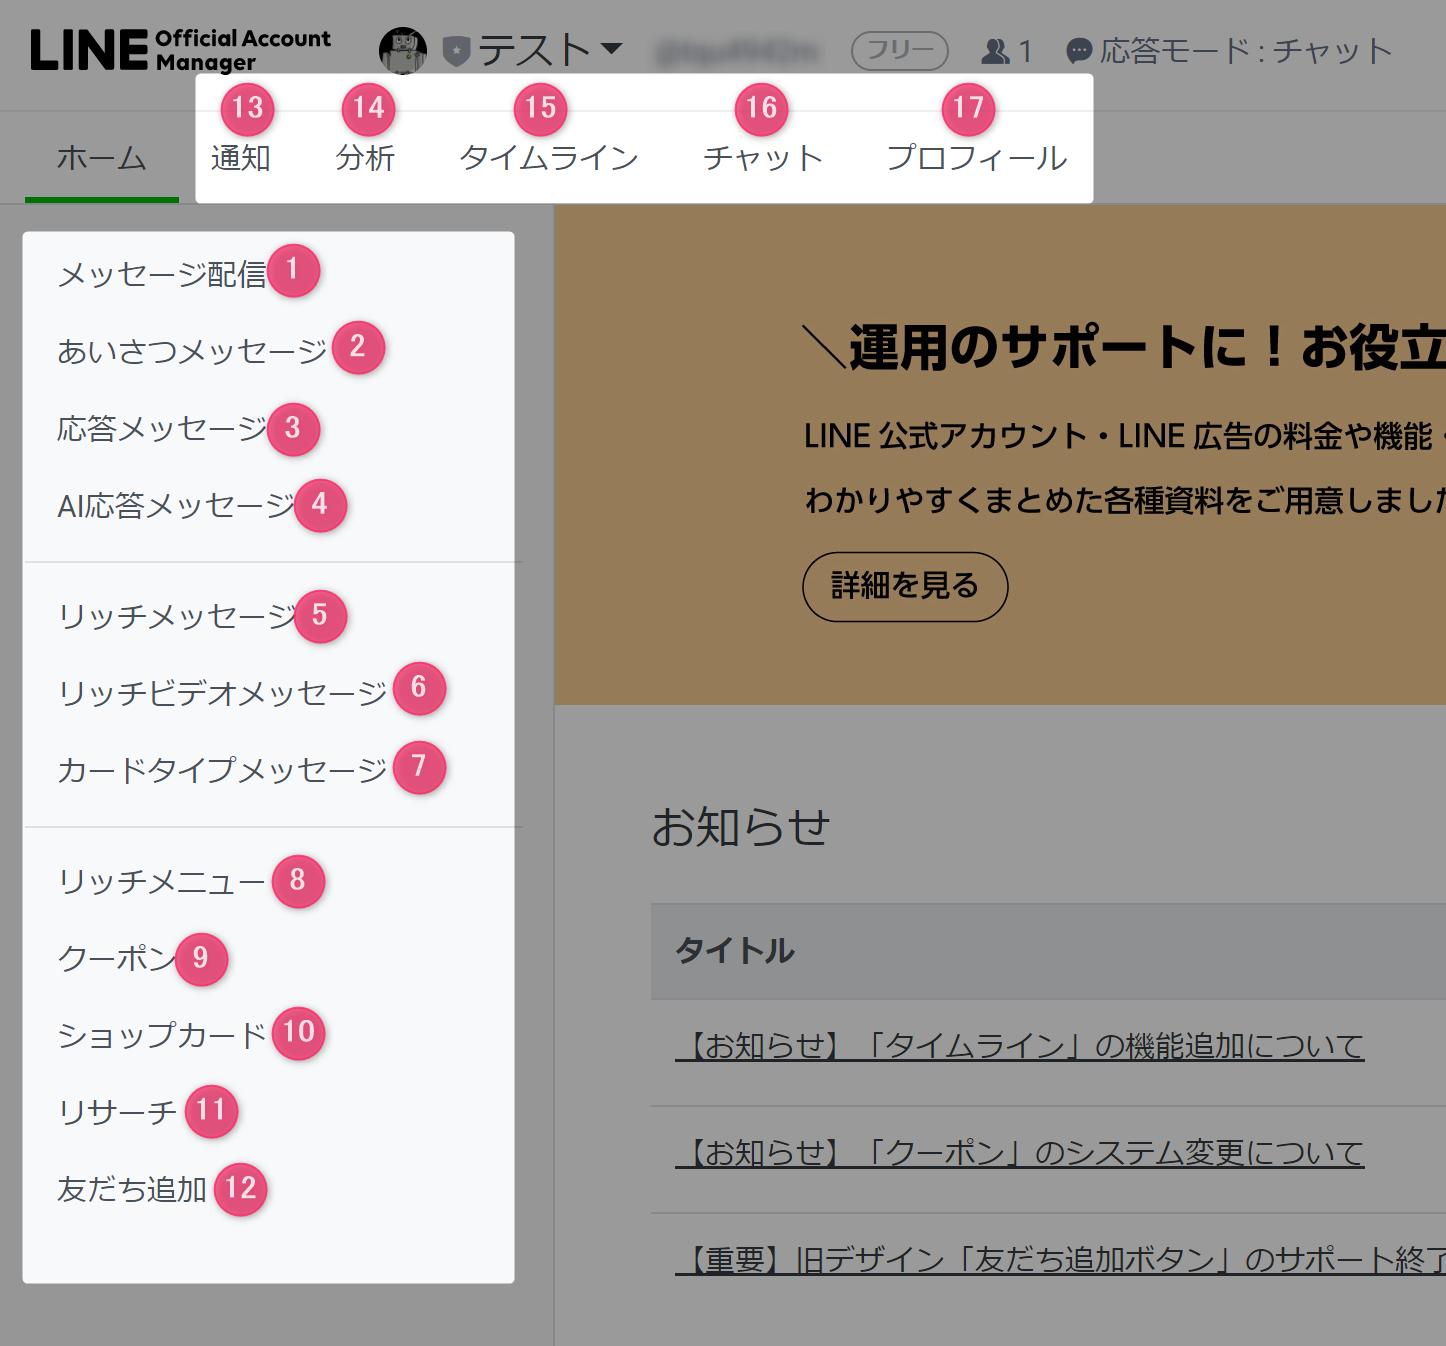 LINE公式アカウントの管理画面